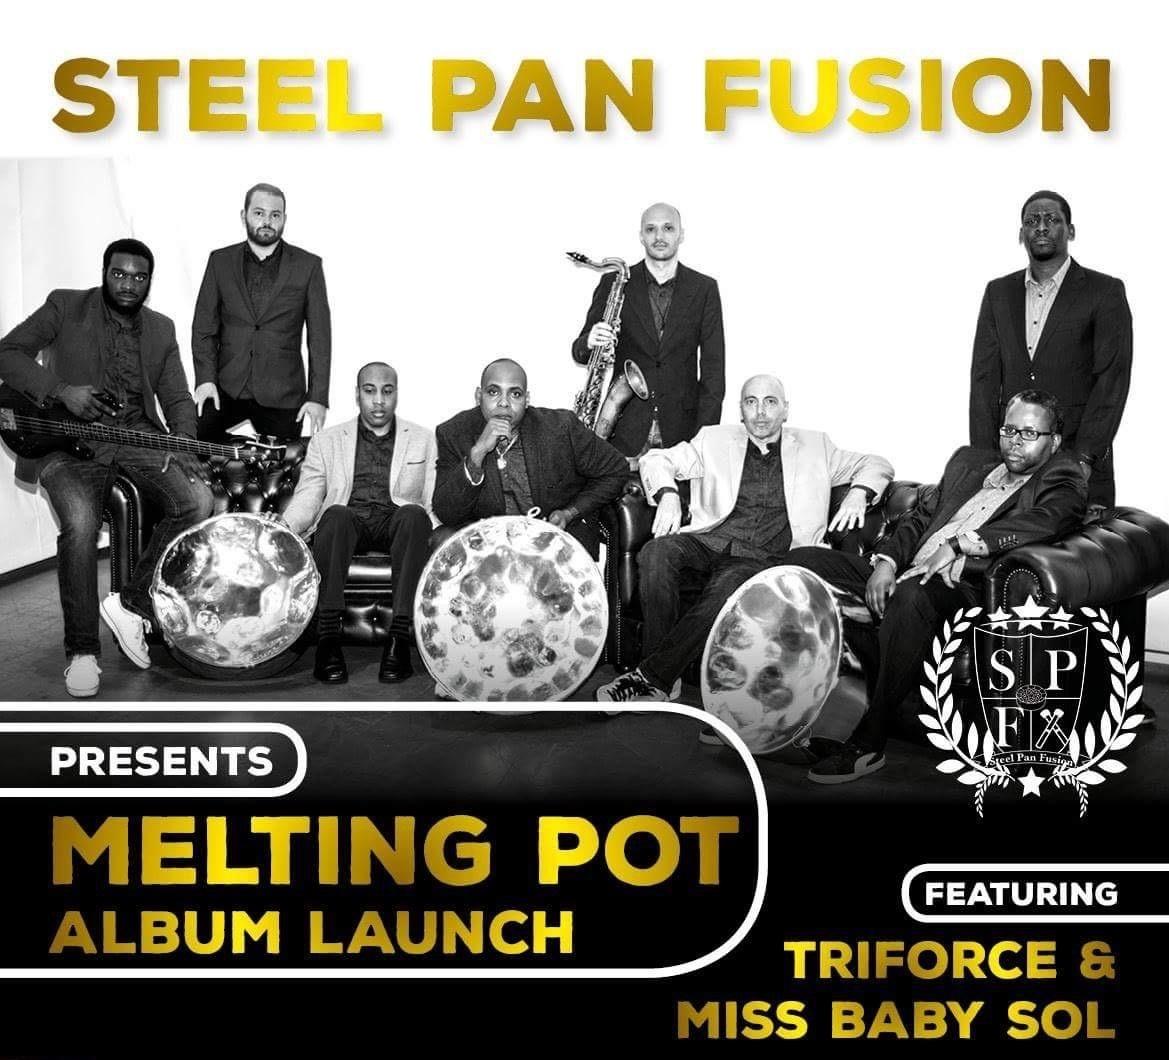 Steel Pan Fusion